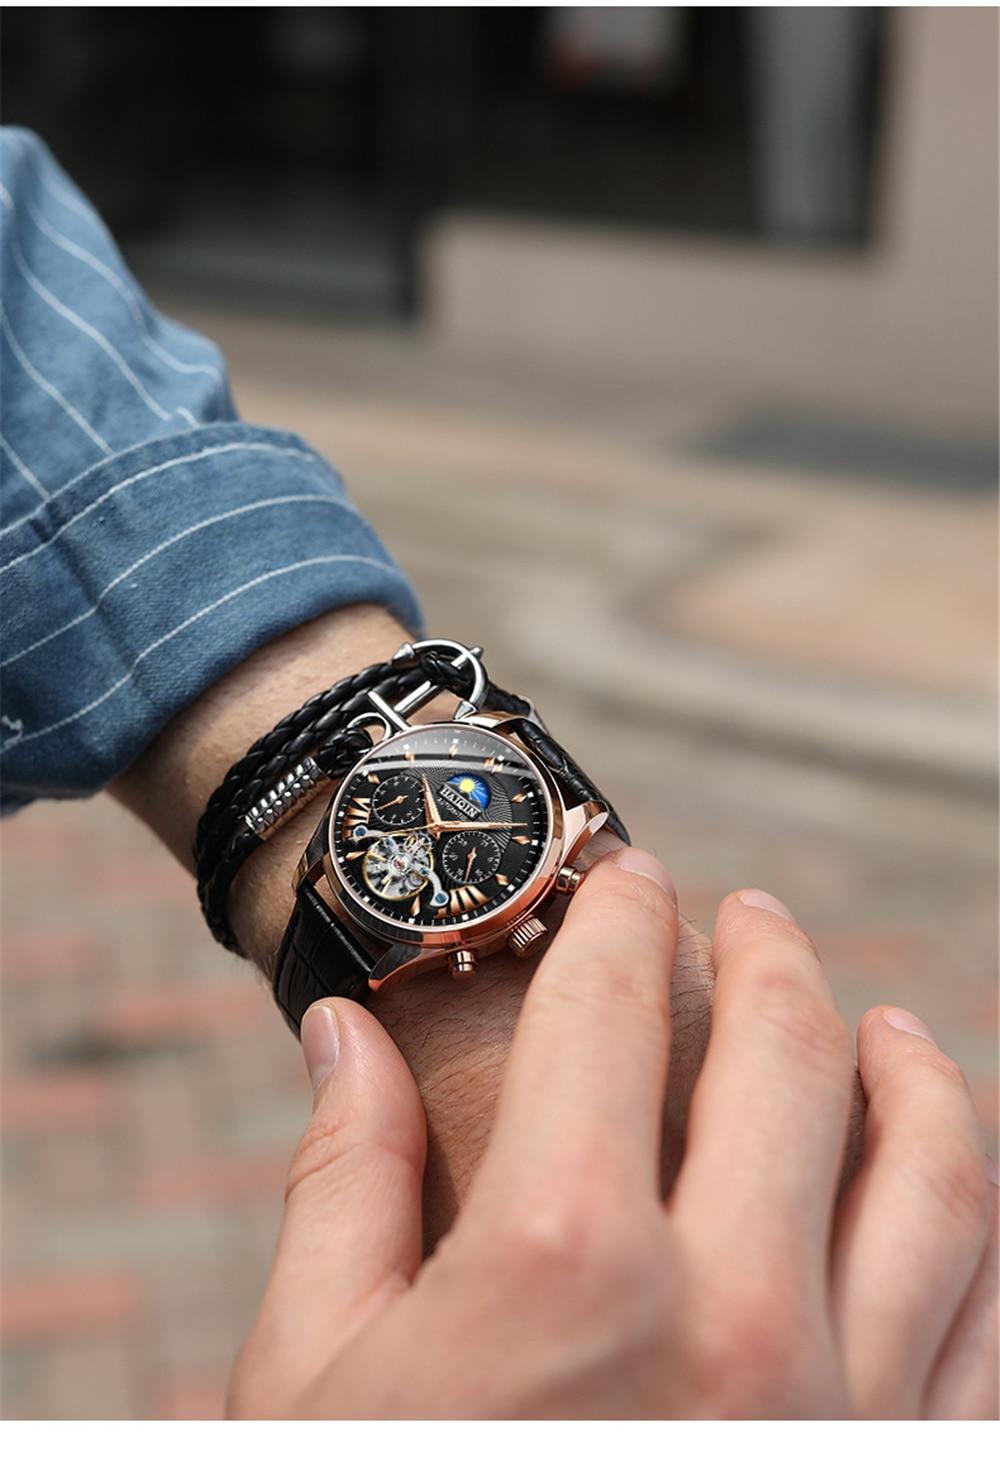 HTB1JoeHXPnuK1RkSmFPq6AuzFXaB HAIQIN men's/mens watches top brand luxury automatic/mechanical/luxury watch men sport wristwatch mens reloj hombre tourbillon